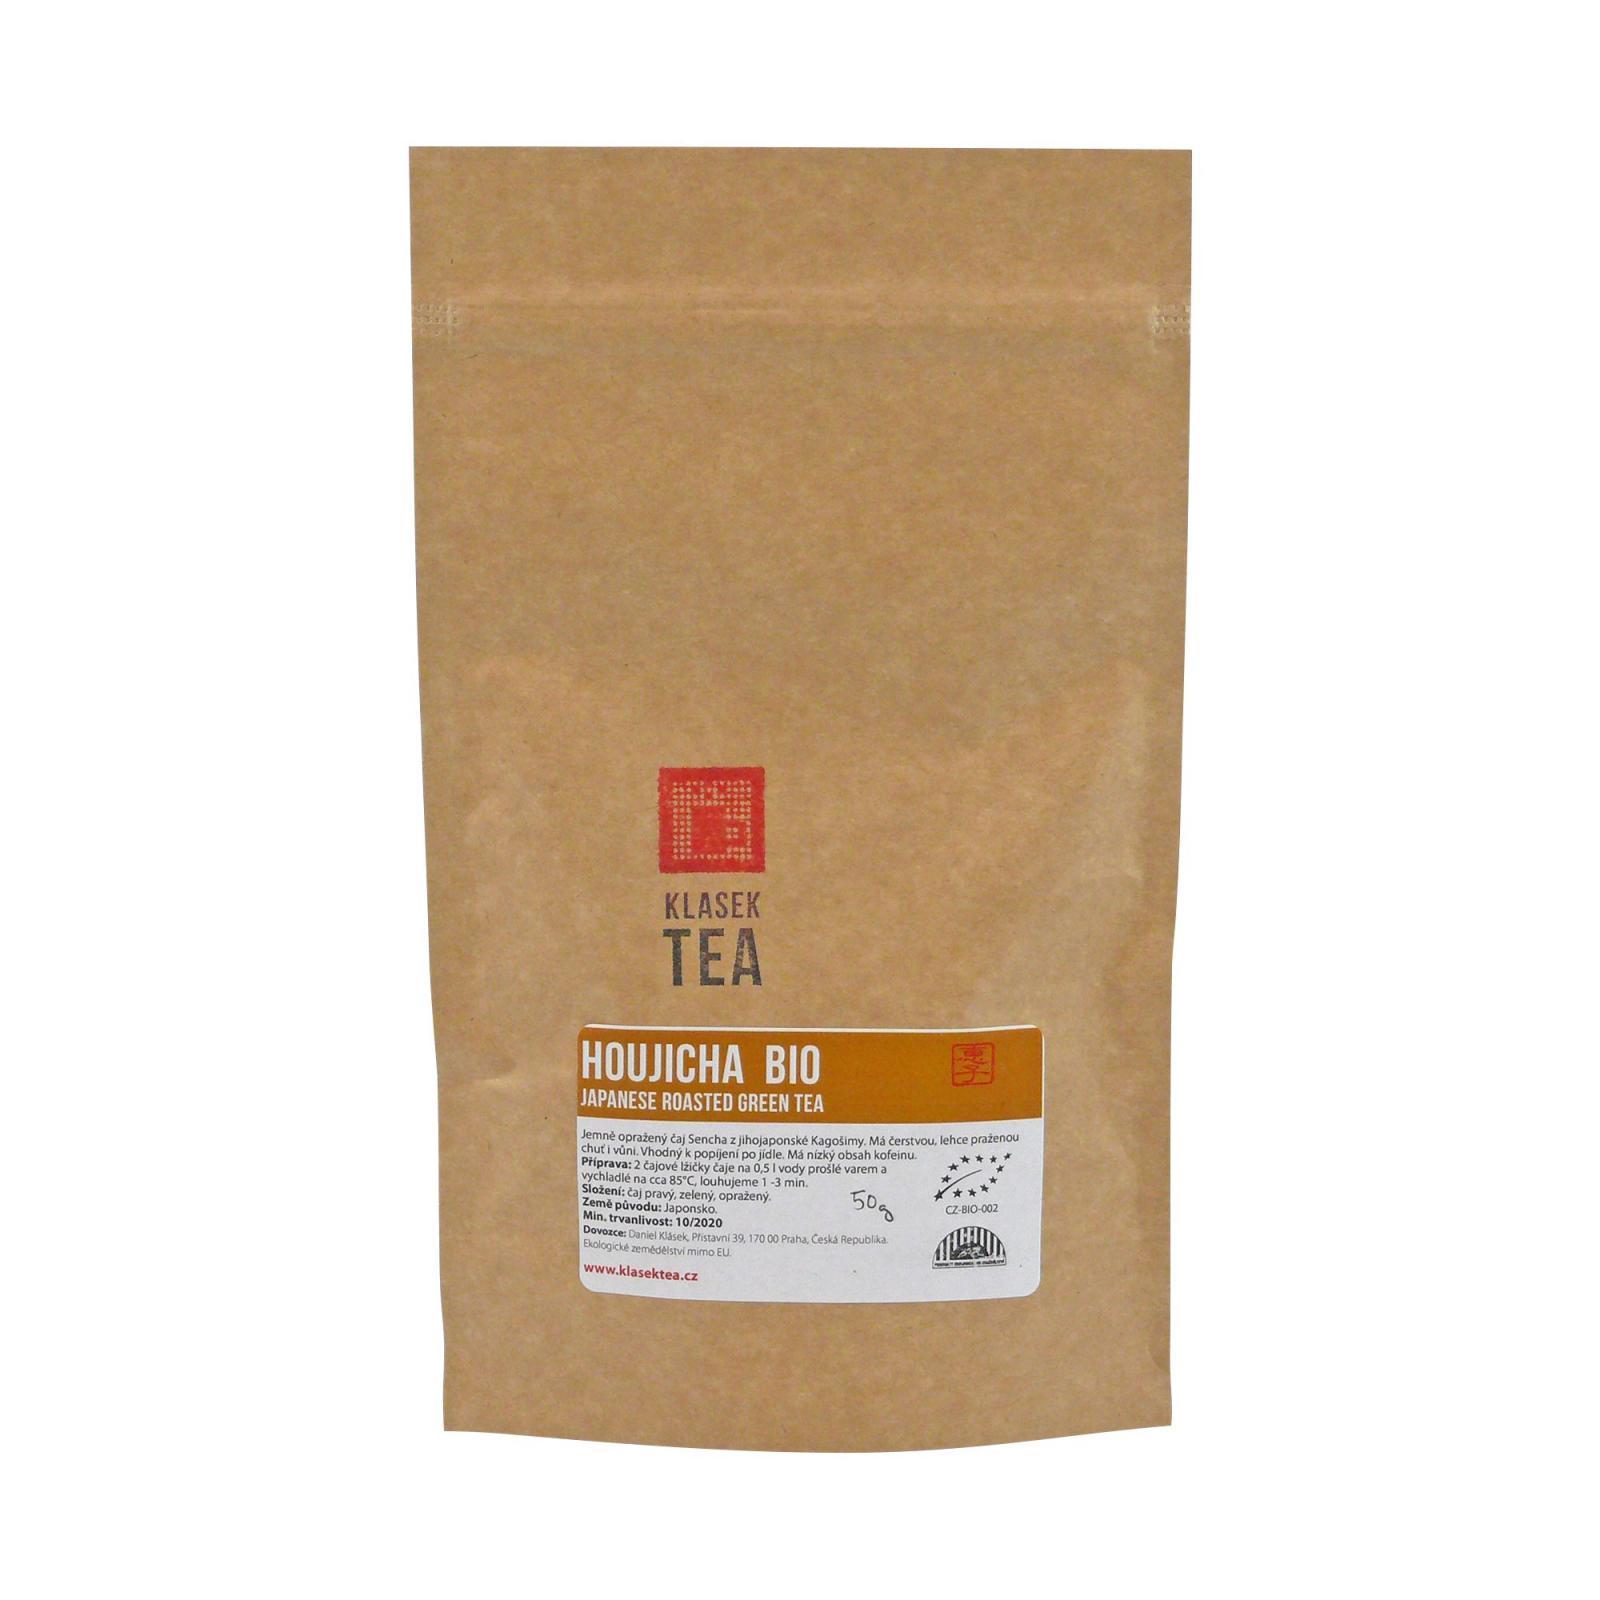 Klasek Tea Zelený čaj Houjicha, bio 50 g